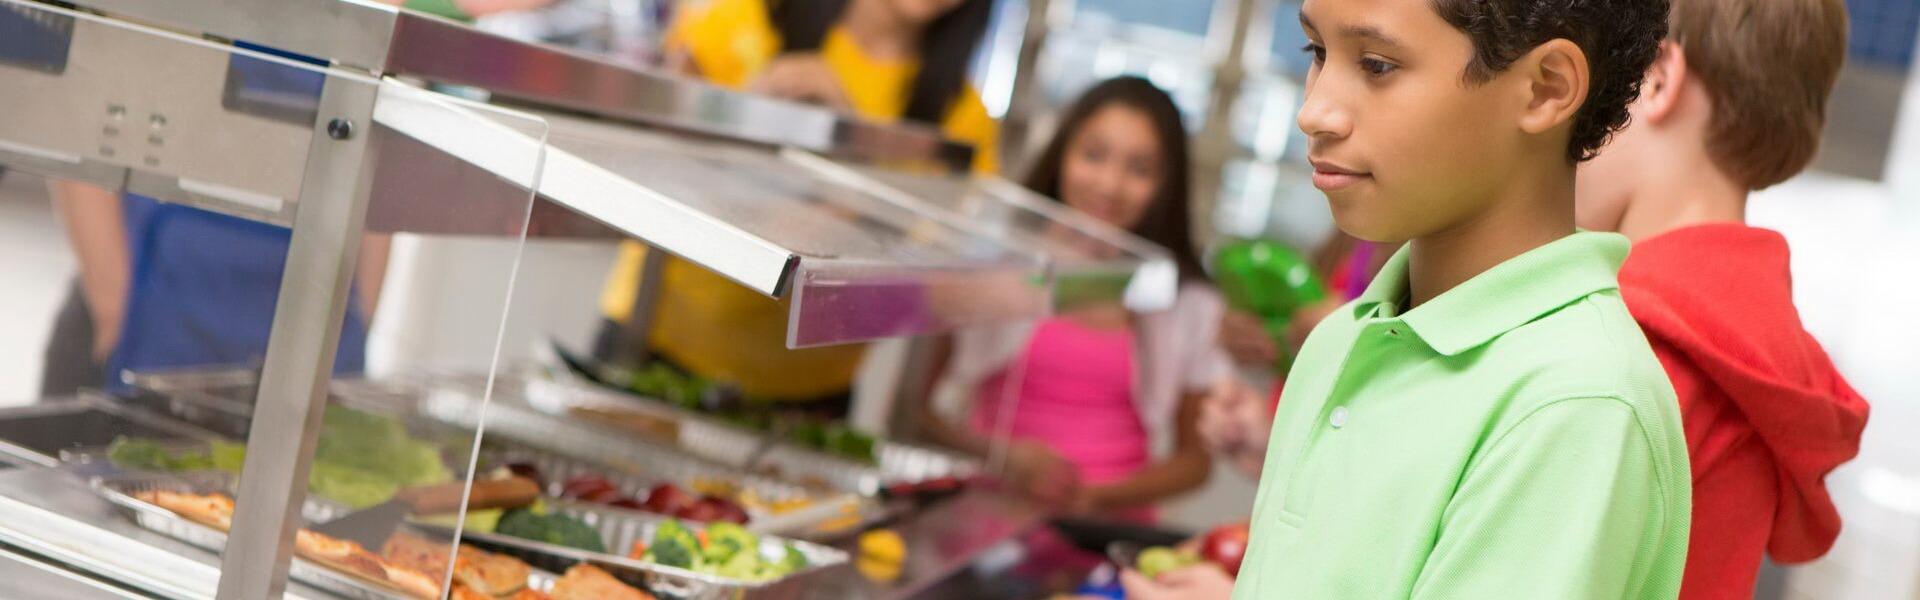 Schools Cafeterias Restaurants